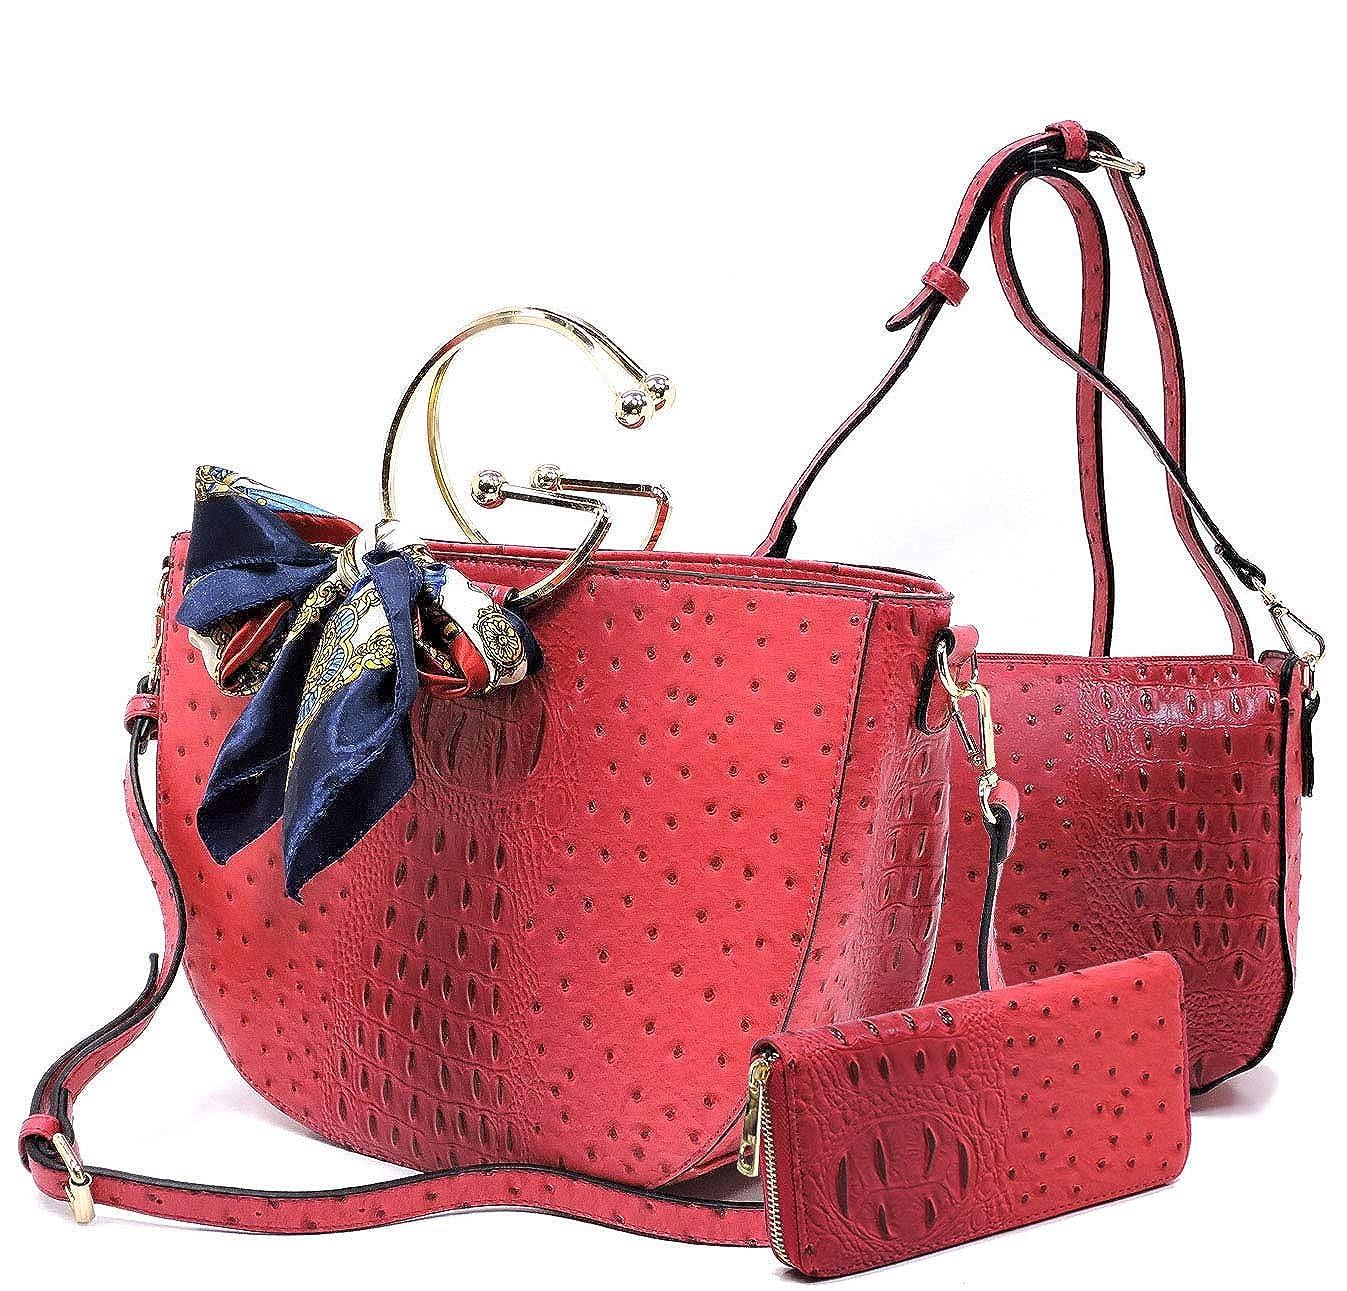 Cherry Handbag Republic Ostrich Embossed Set  Scarf Accent HalfMoon Tote, Crossbody, Wallet